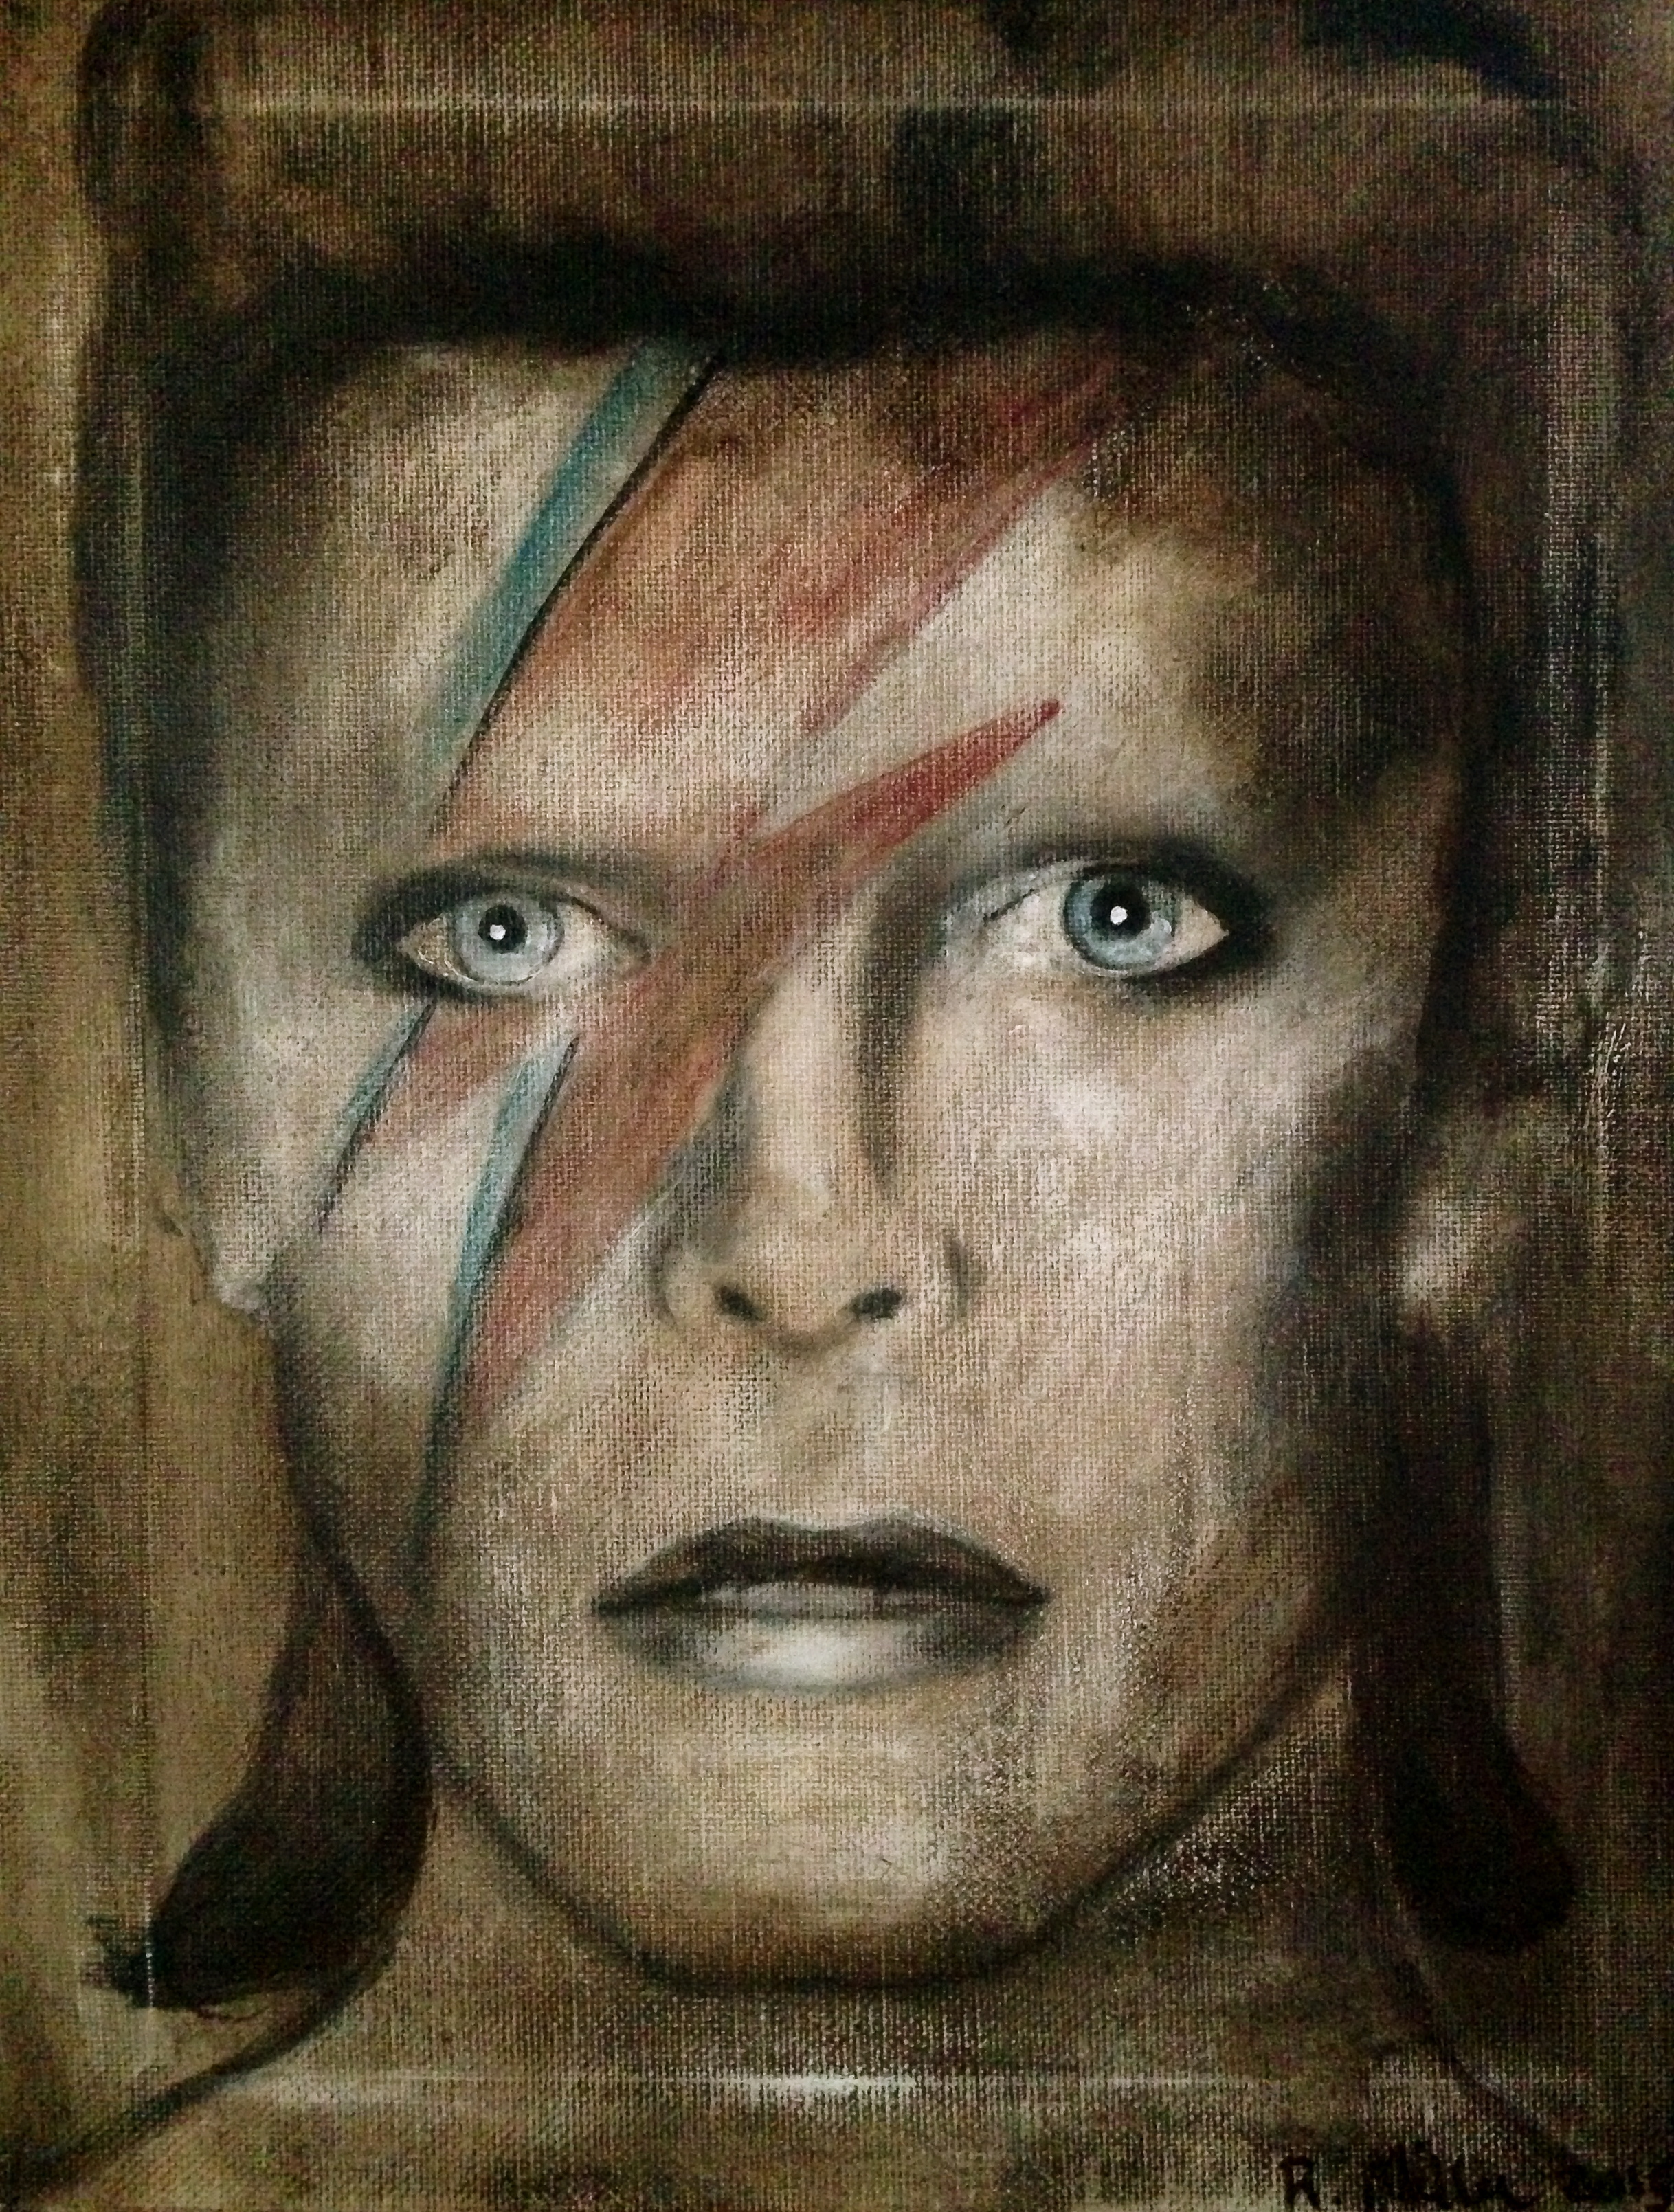 David Bowie/Ziggy Stardust, 2015   Acrylic & oil on canvas